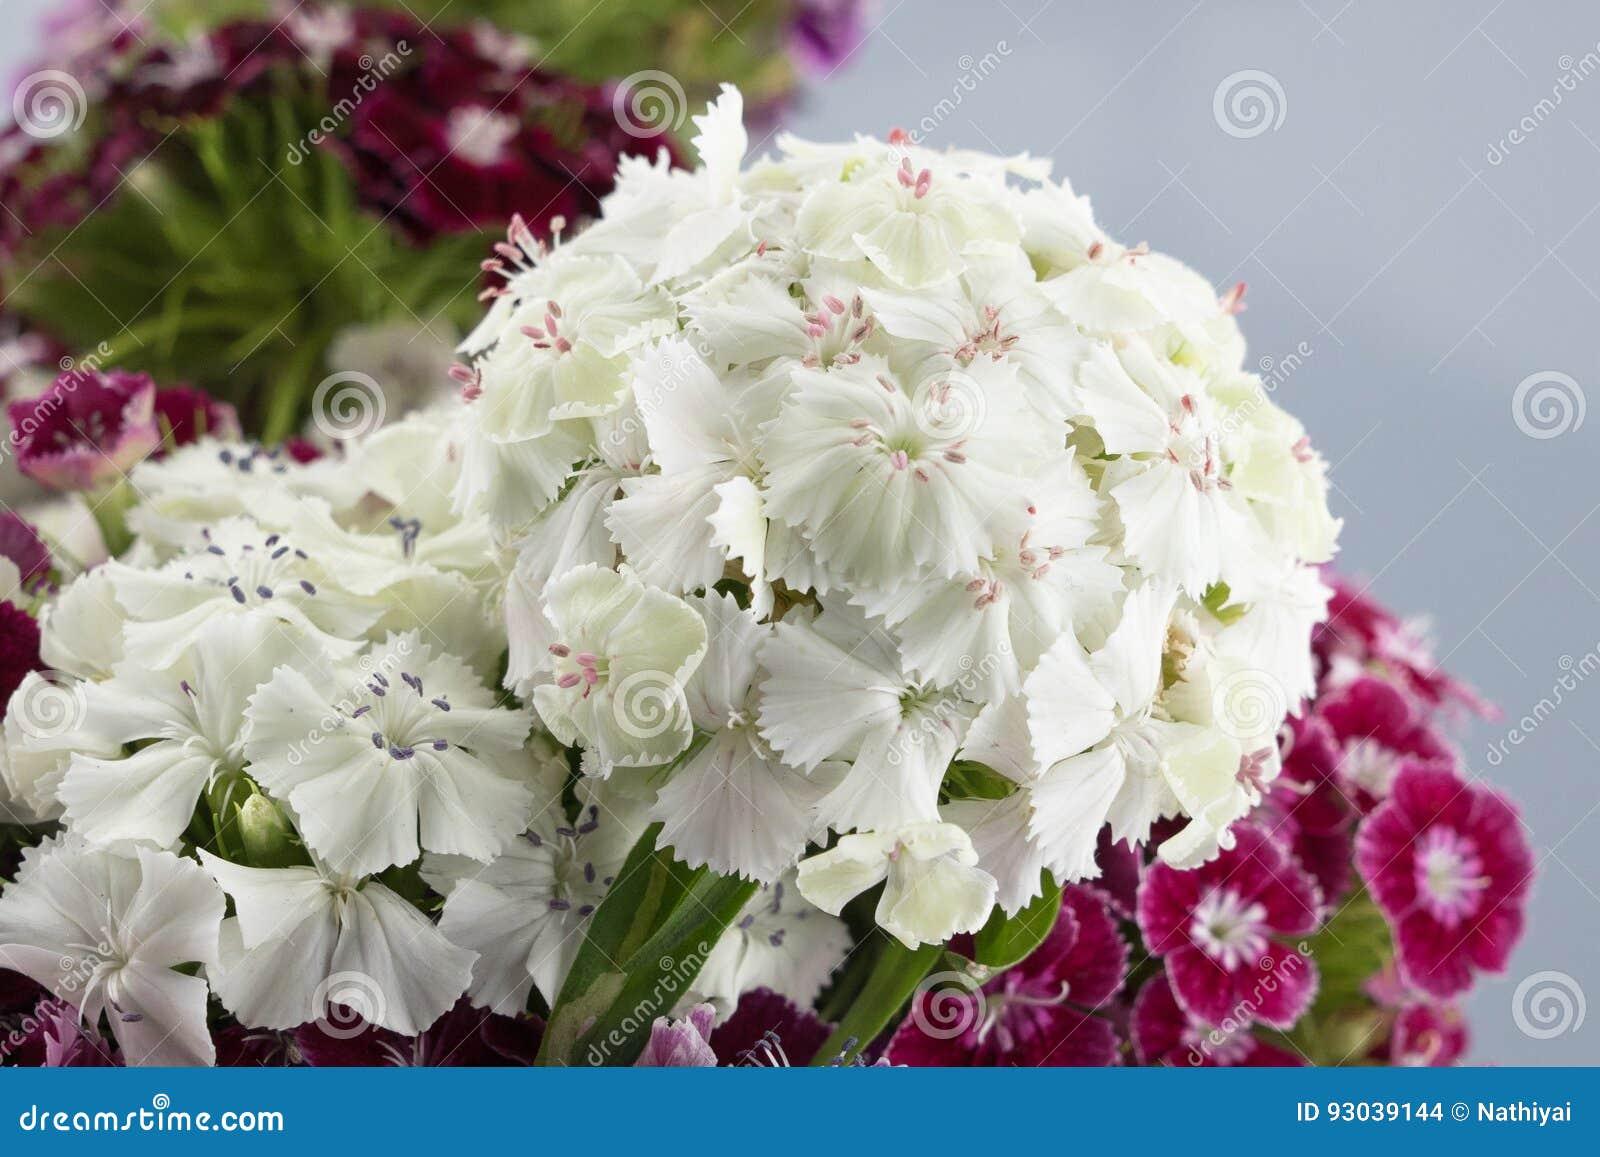 White Sweet William Flowers Stock Photo Image Of Isolated Plant